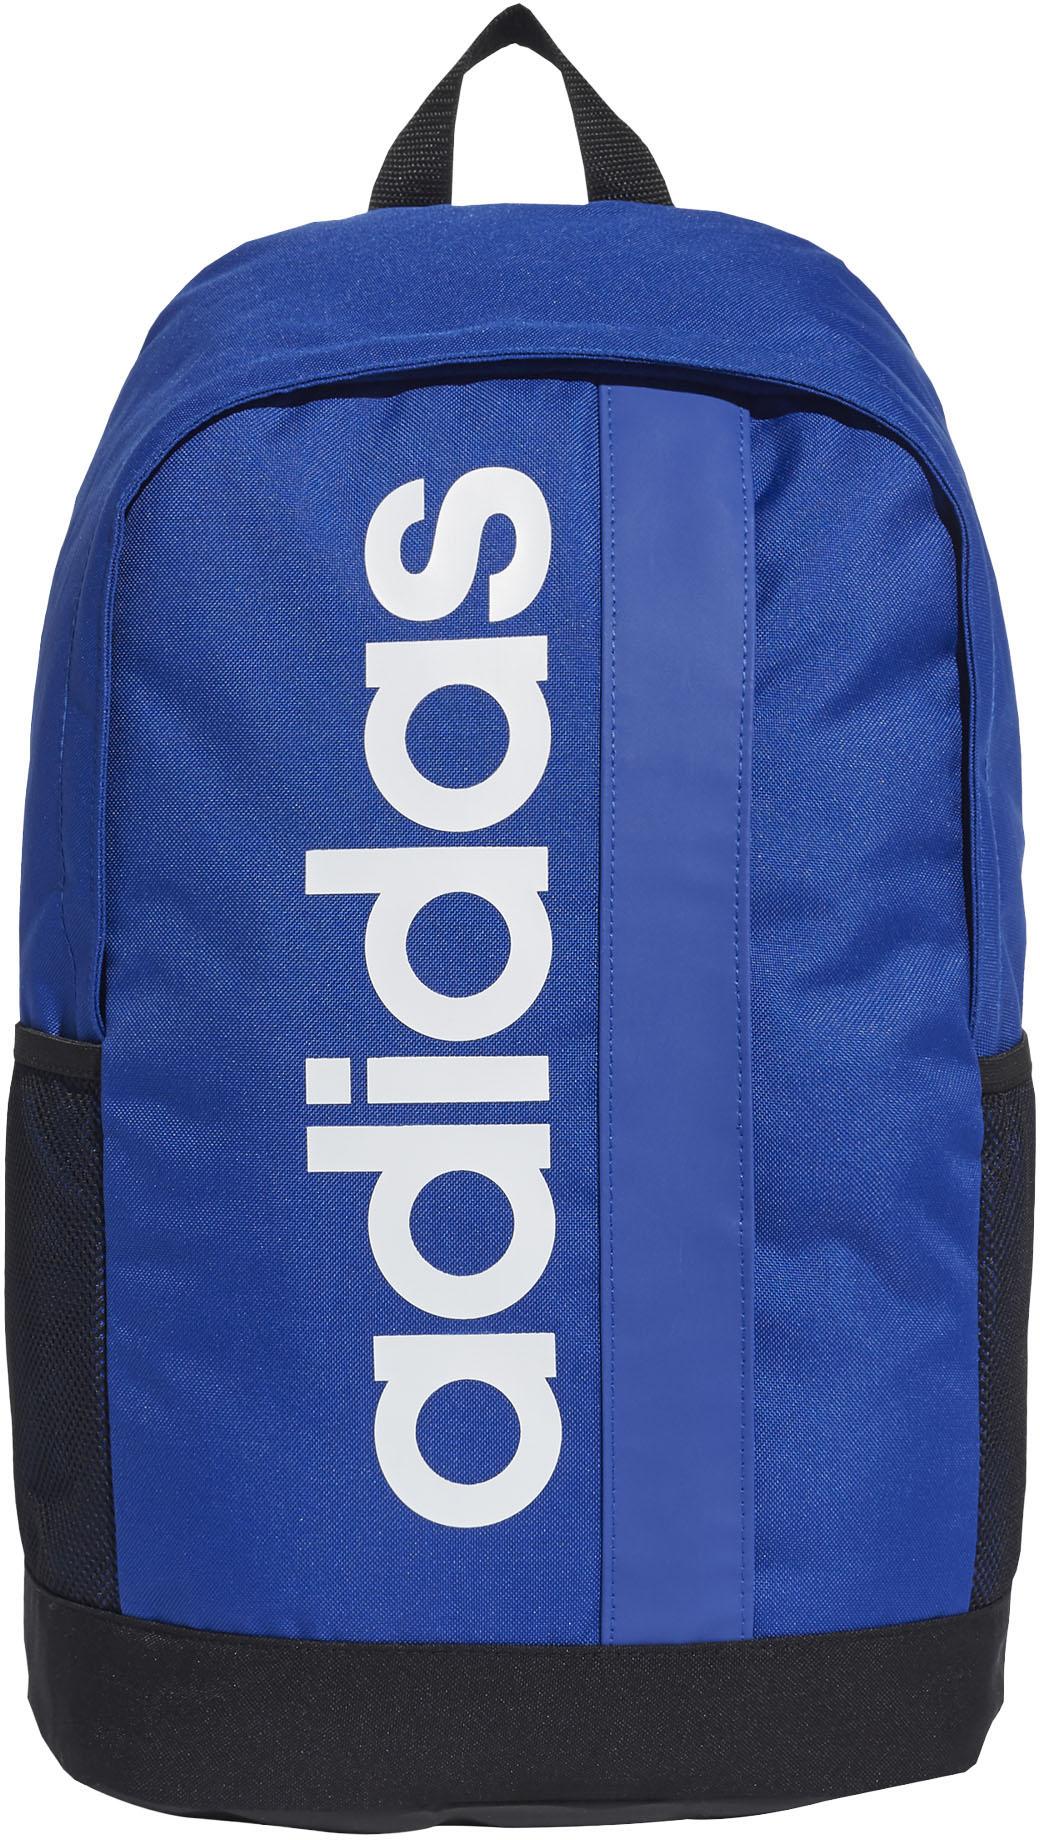 adidas Performance Sportrucksack LINEAR CORE BACKPACK blau Herren Taschen Rucksäcke